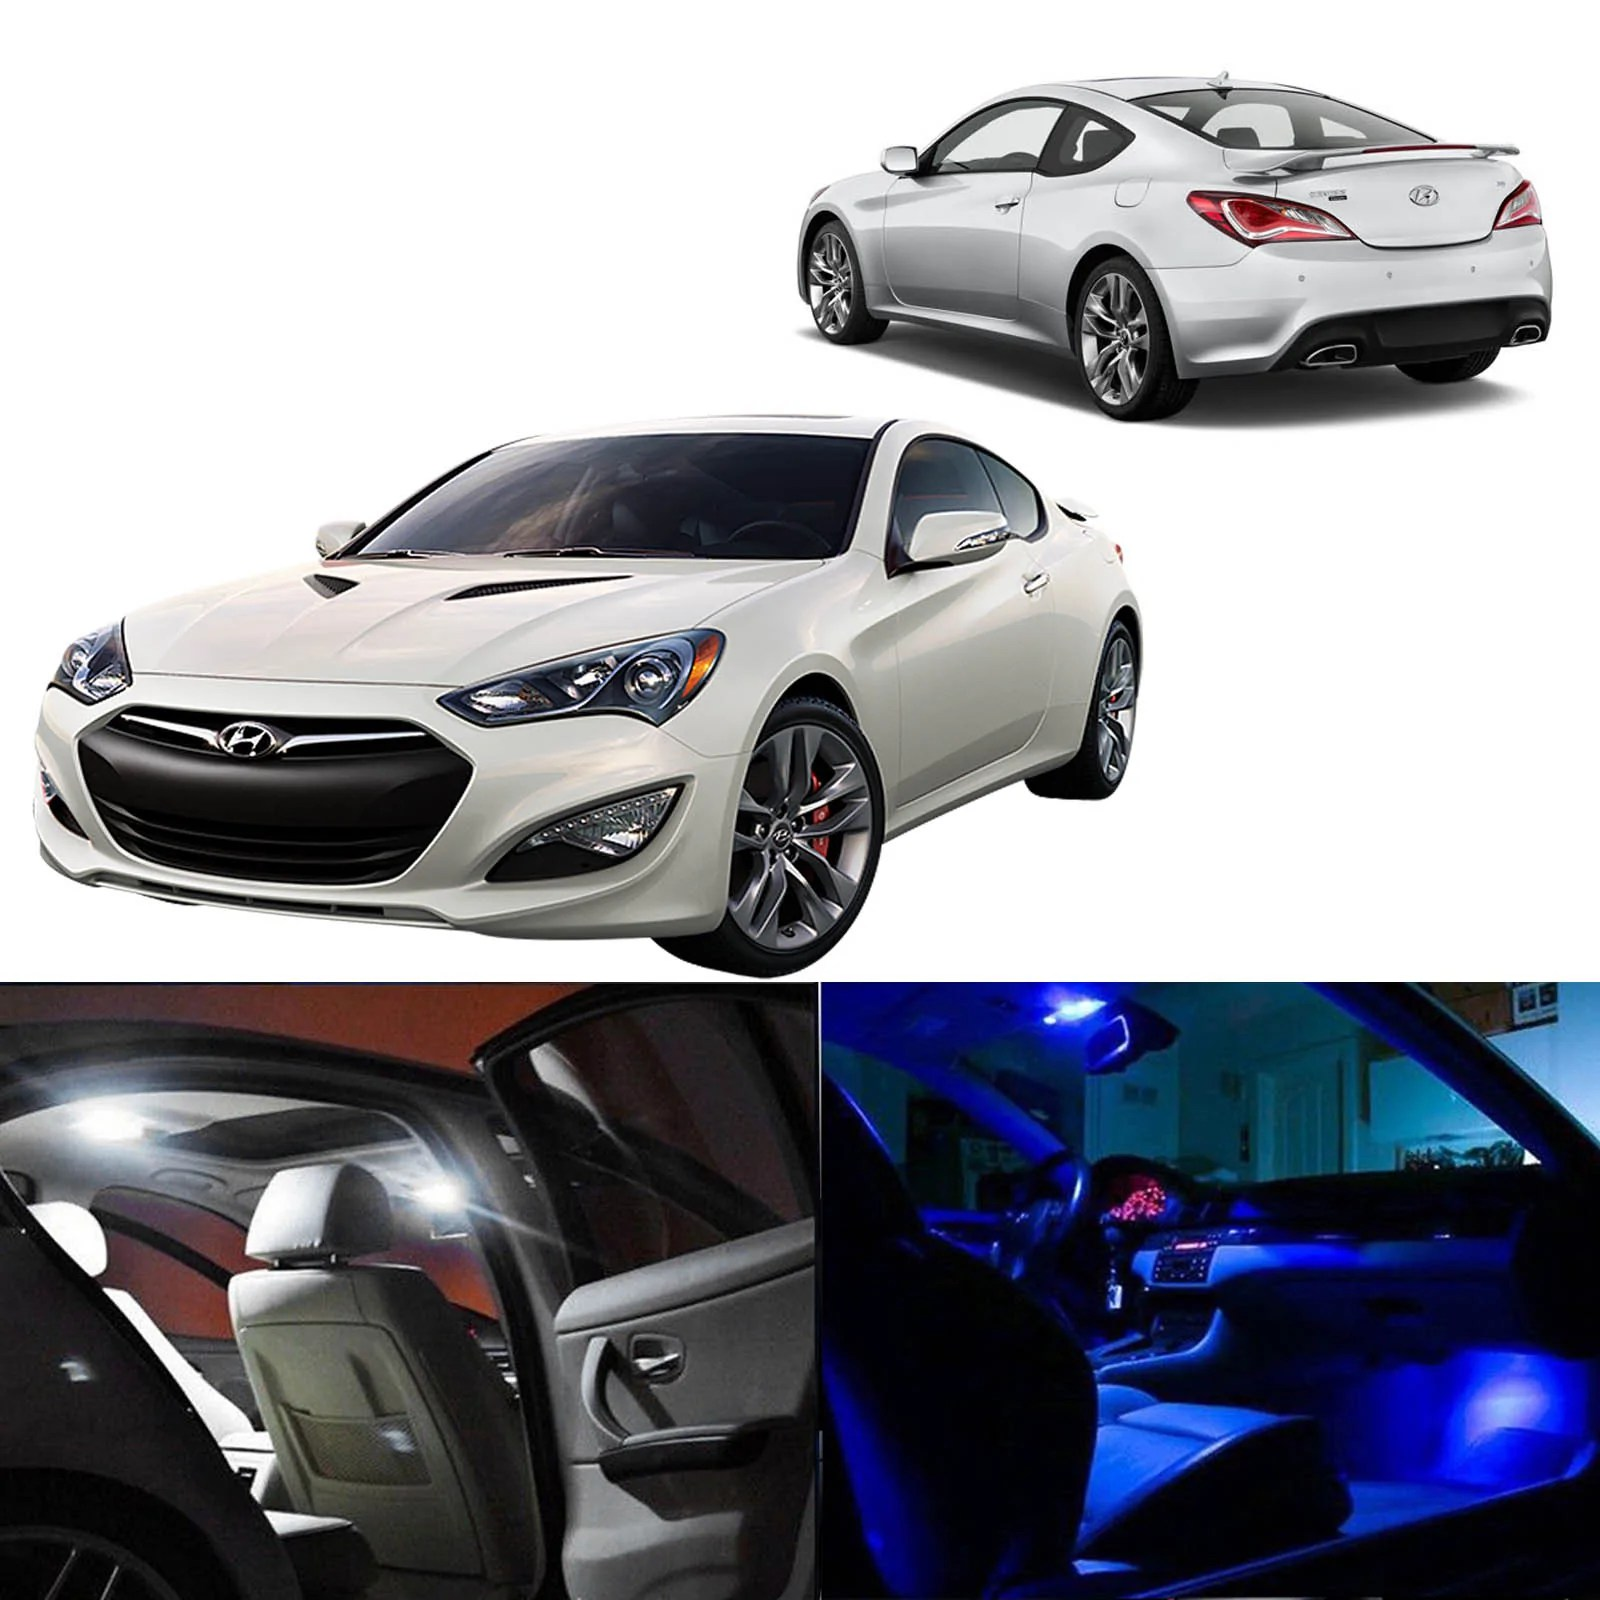 2010 2015 hyundai genesis coupe 6x interior led lights package kit white blue  [ 1600 x 1600 Pixel ]